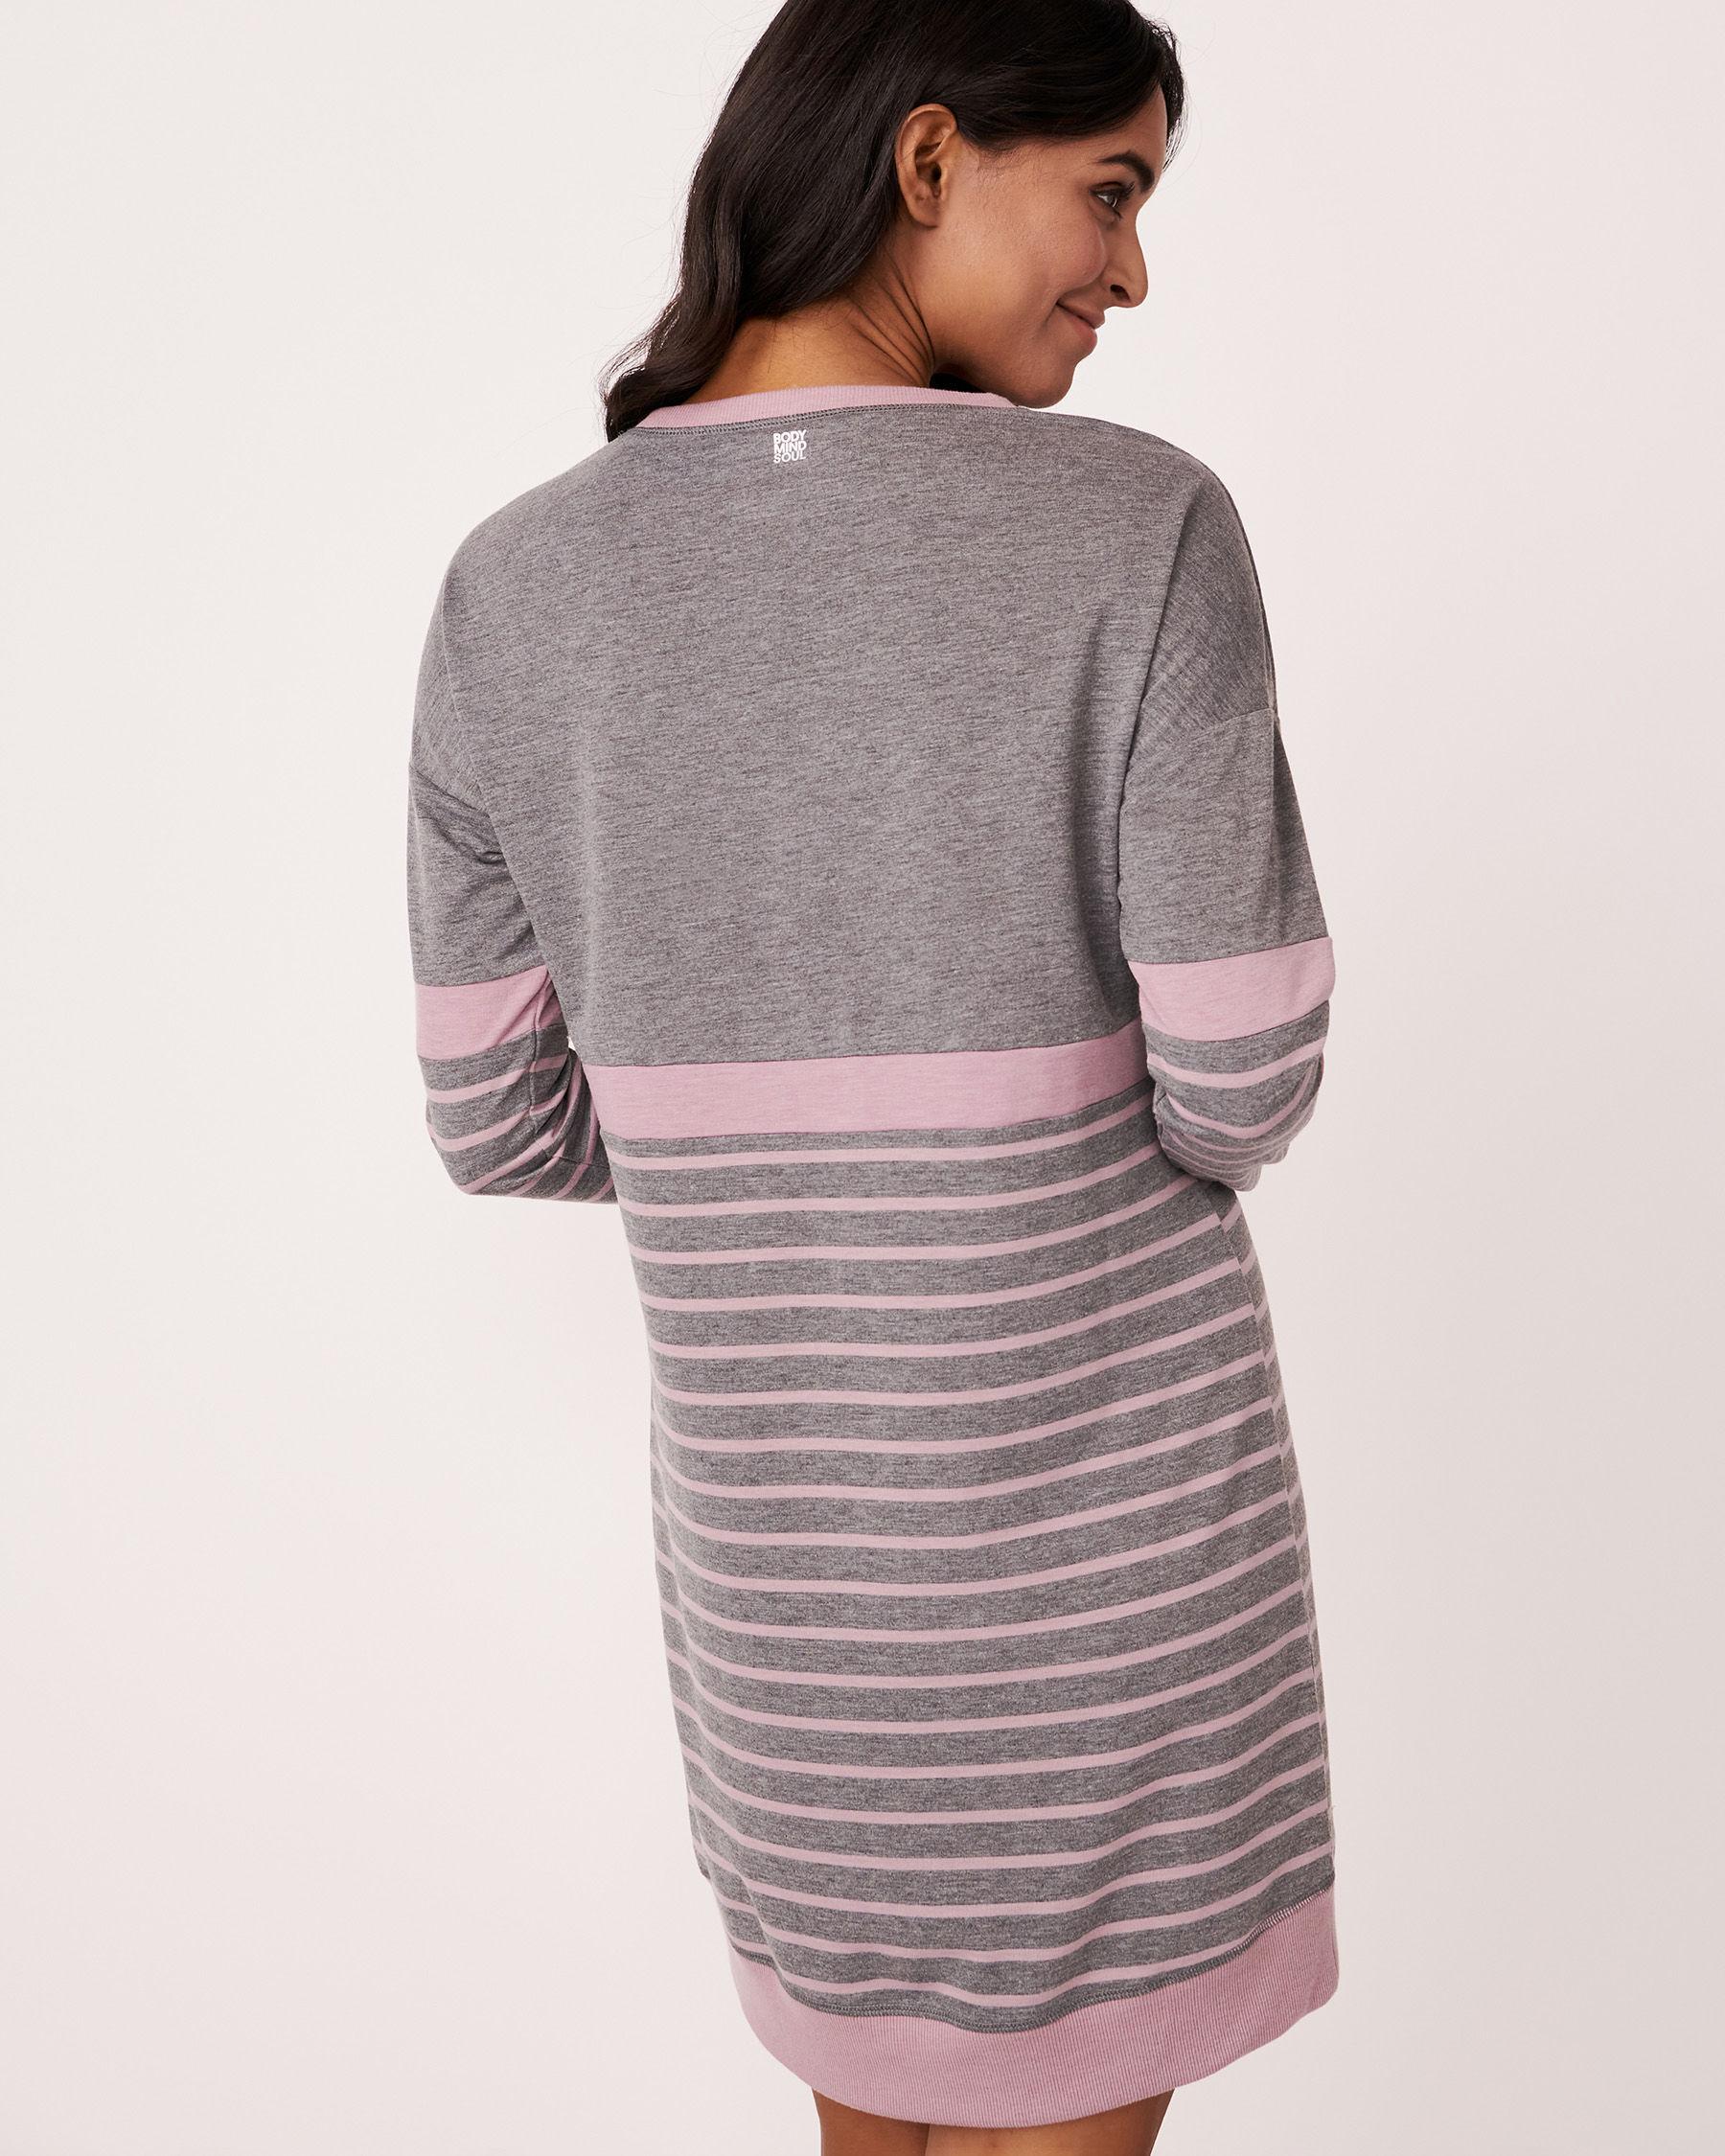 LA VIE EN ROSE Long Sleeve Striped Dress Grey and pink mix 768-374-0-11 - View2